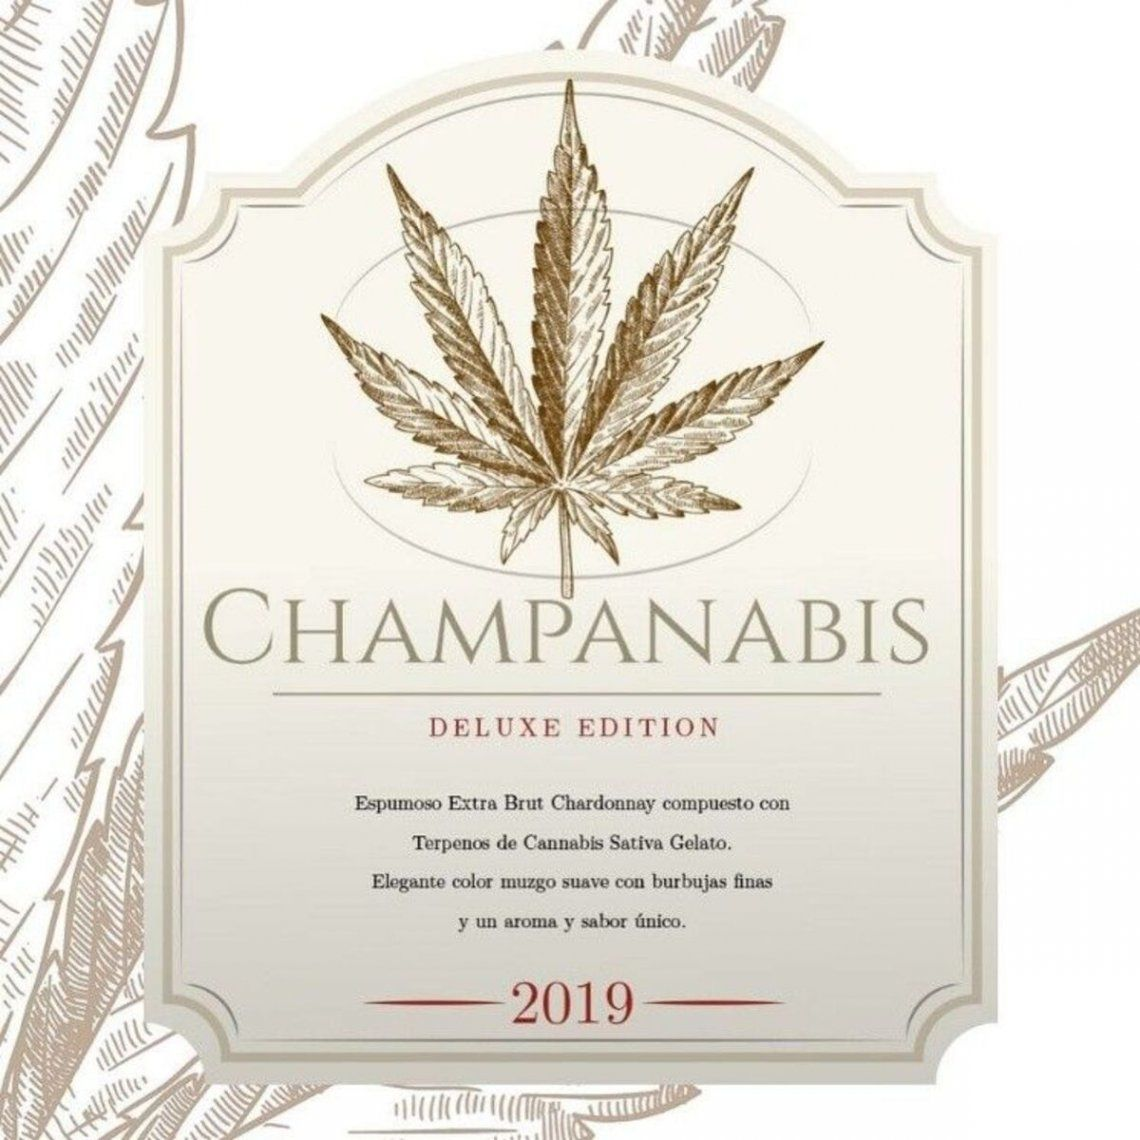 La etiqueta de Champanabis